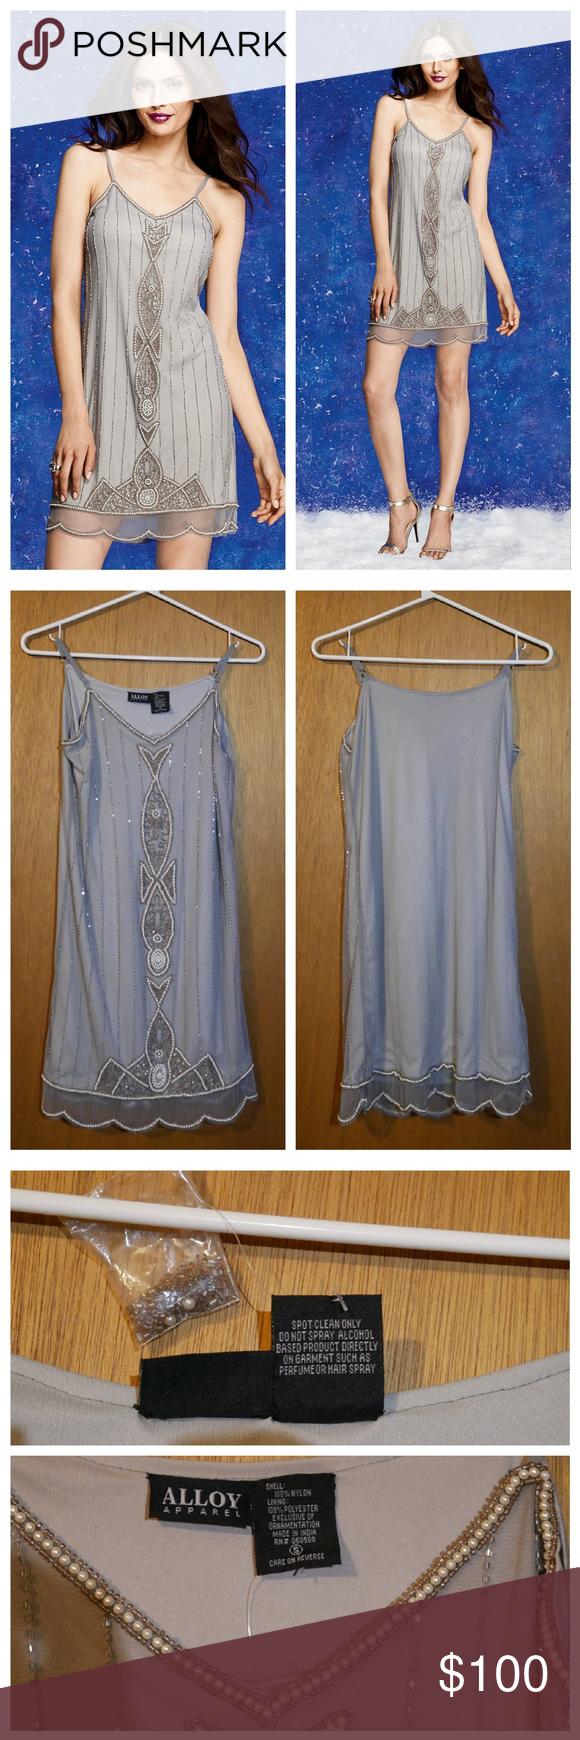 f5604d7a694a ❤😻 Delilah Beaded Slip Dress